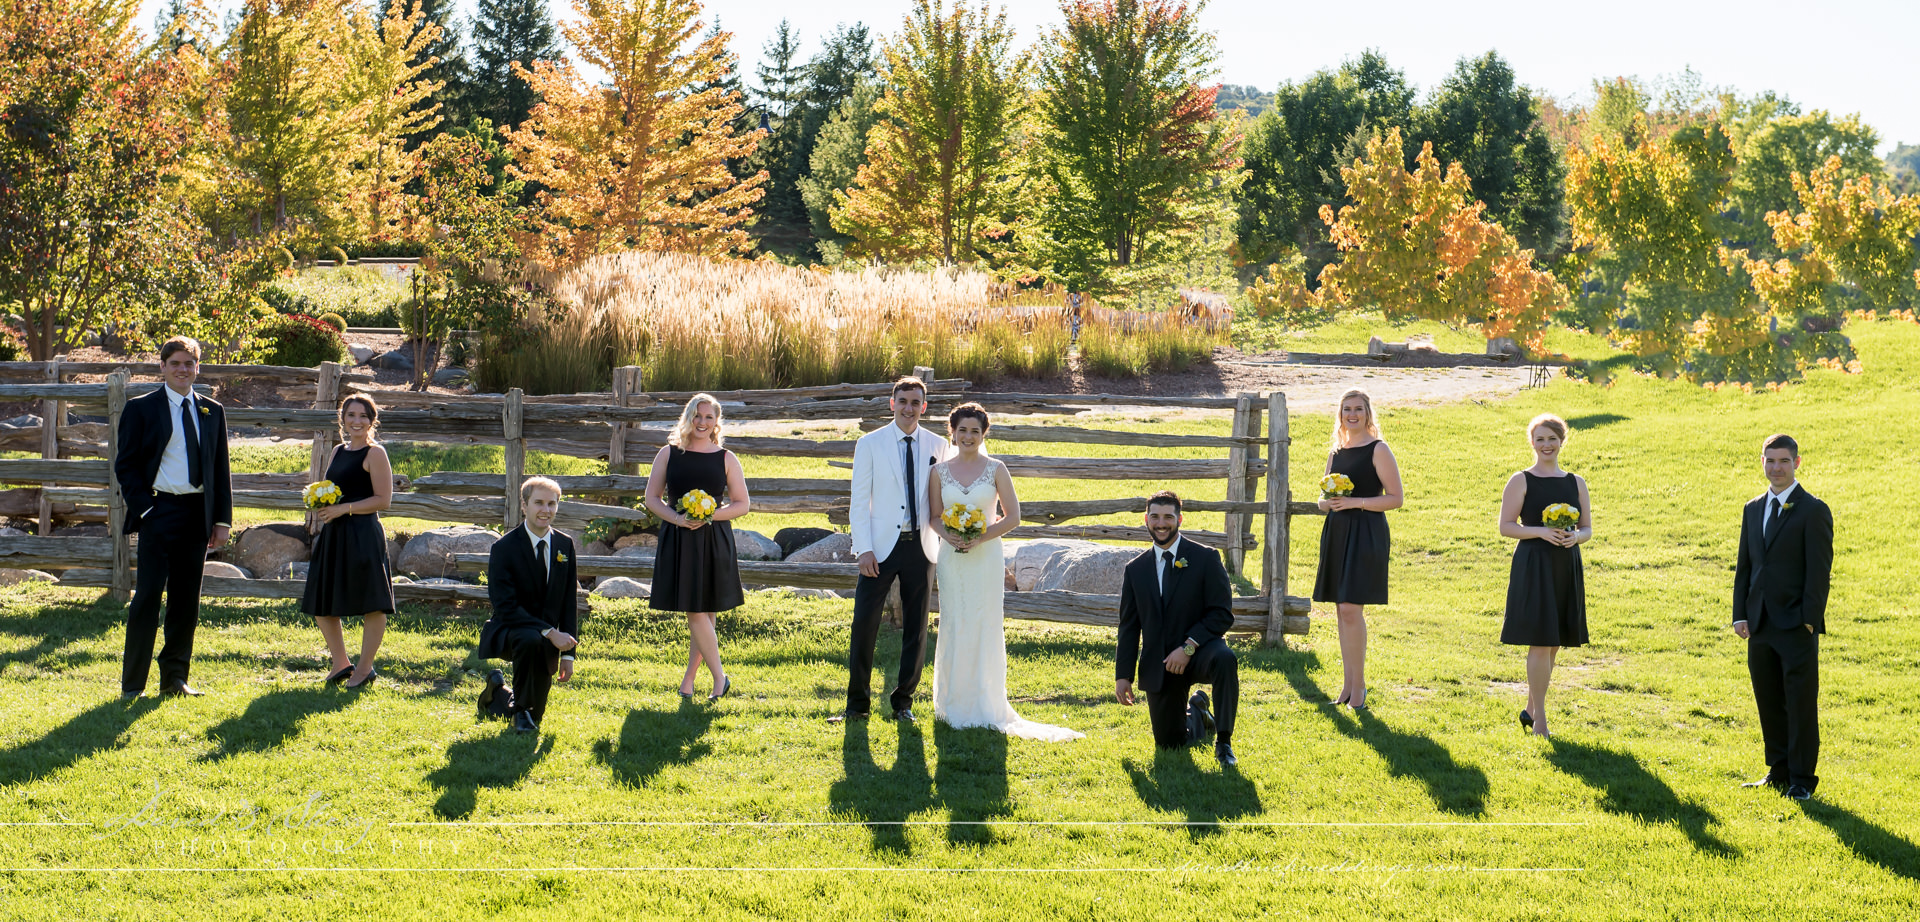 lora-bay-wedding-017